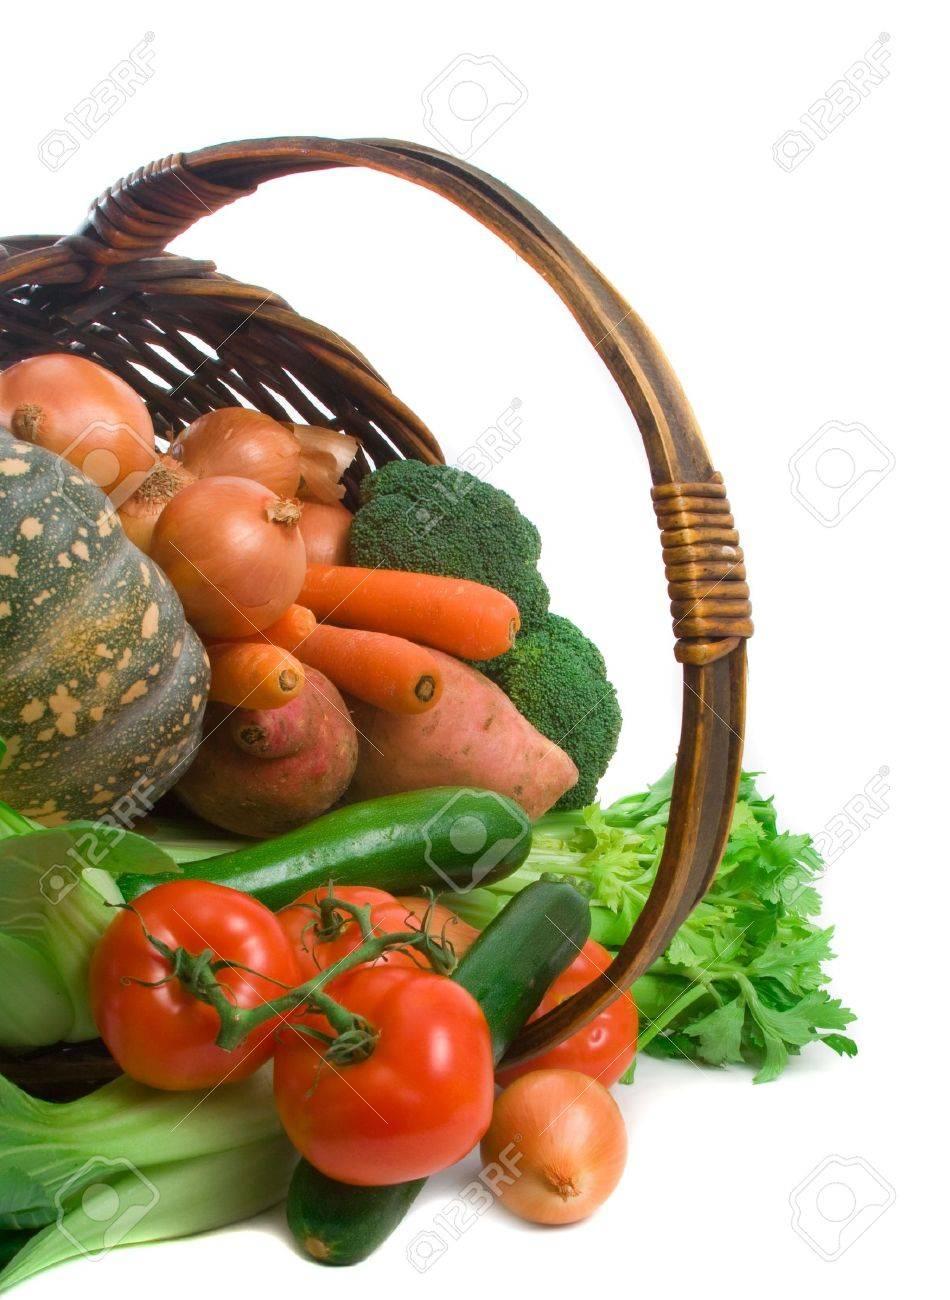 Basket of market fresh vegetables over white background Stock Photo - 5139325